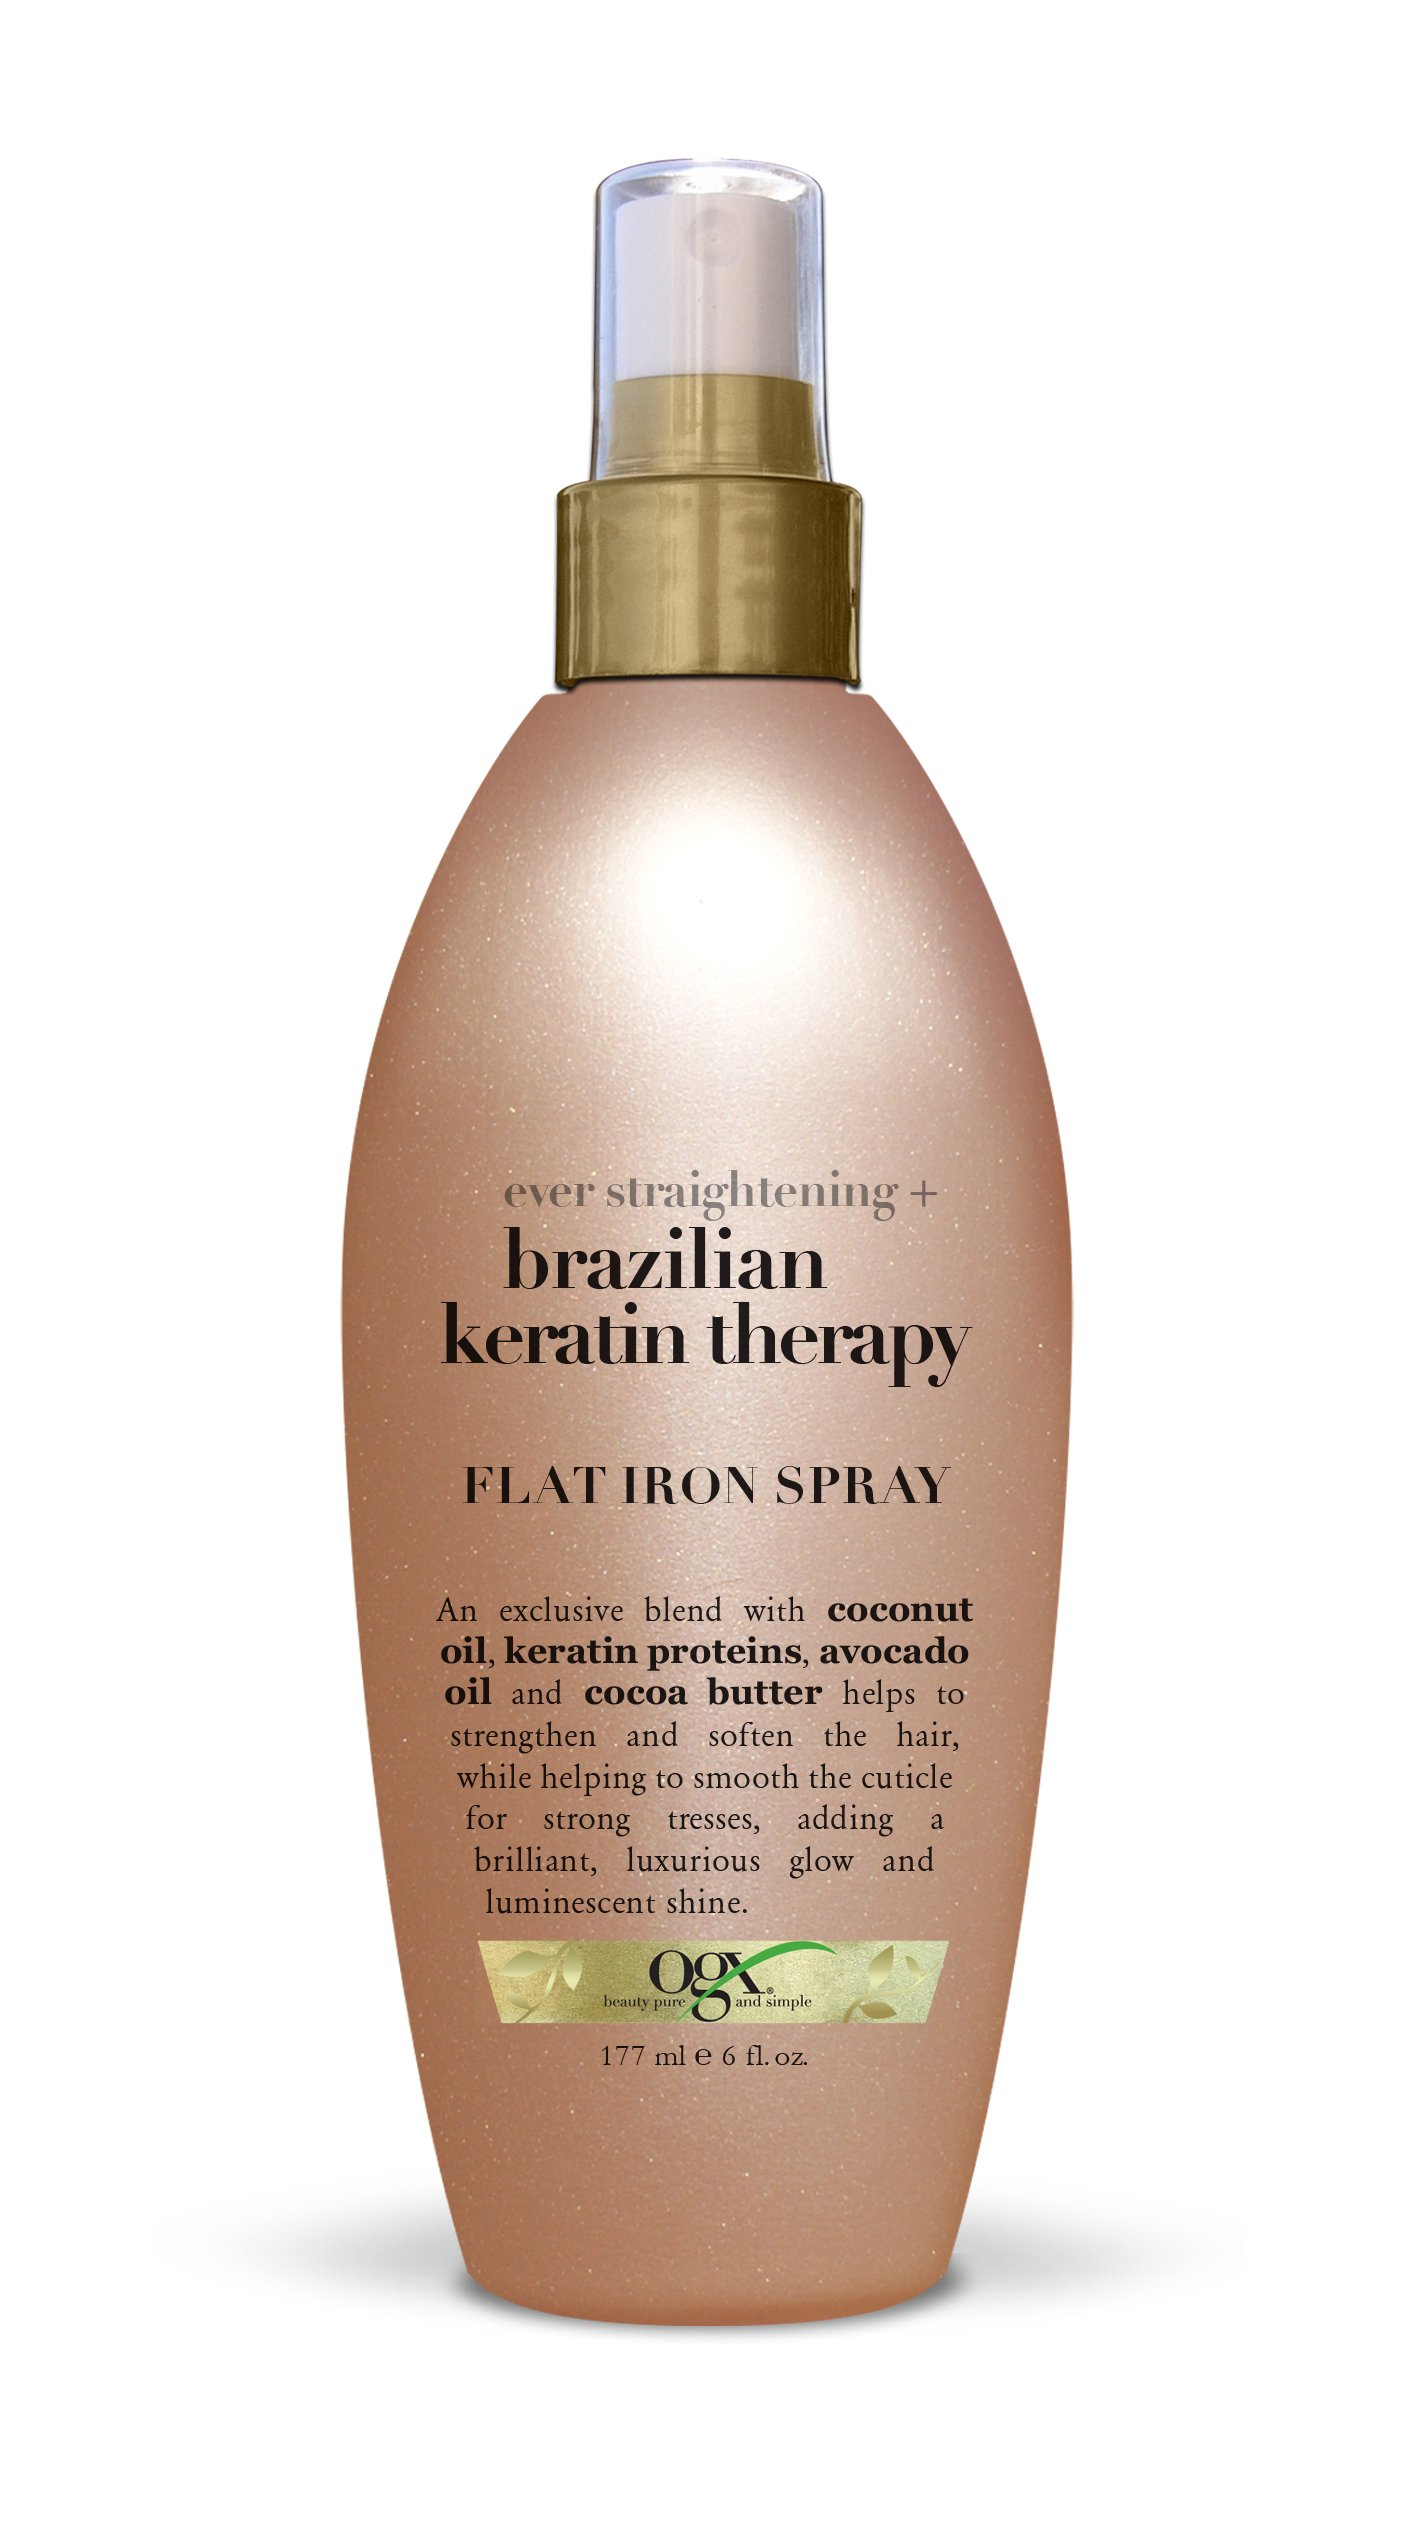 OGX Flat Iron Spray, Ever Straight Brazilian Keratin Therapy, 6oz